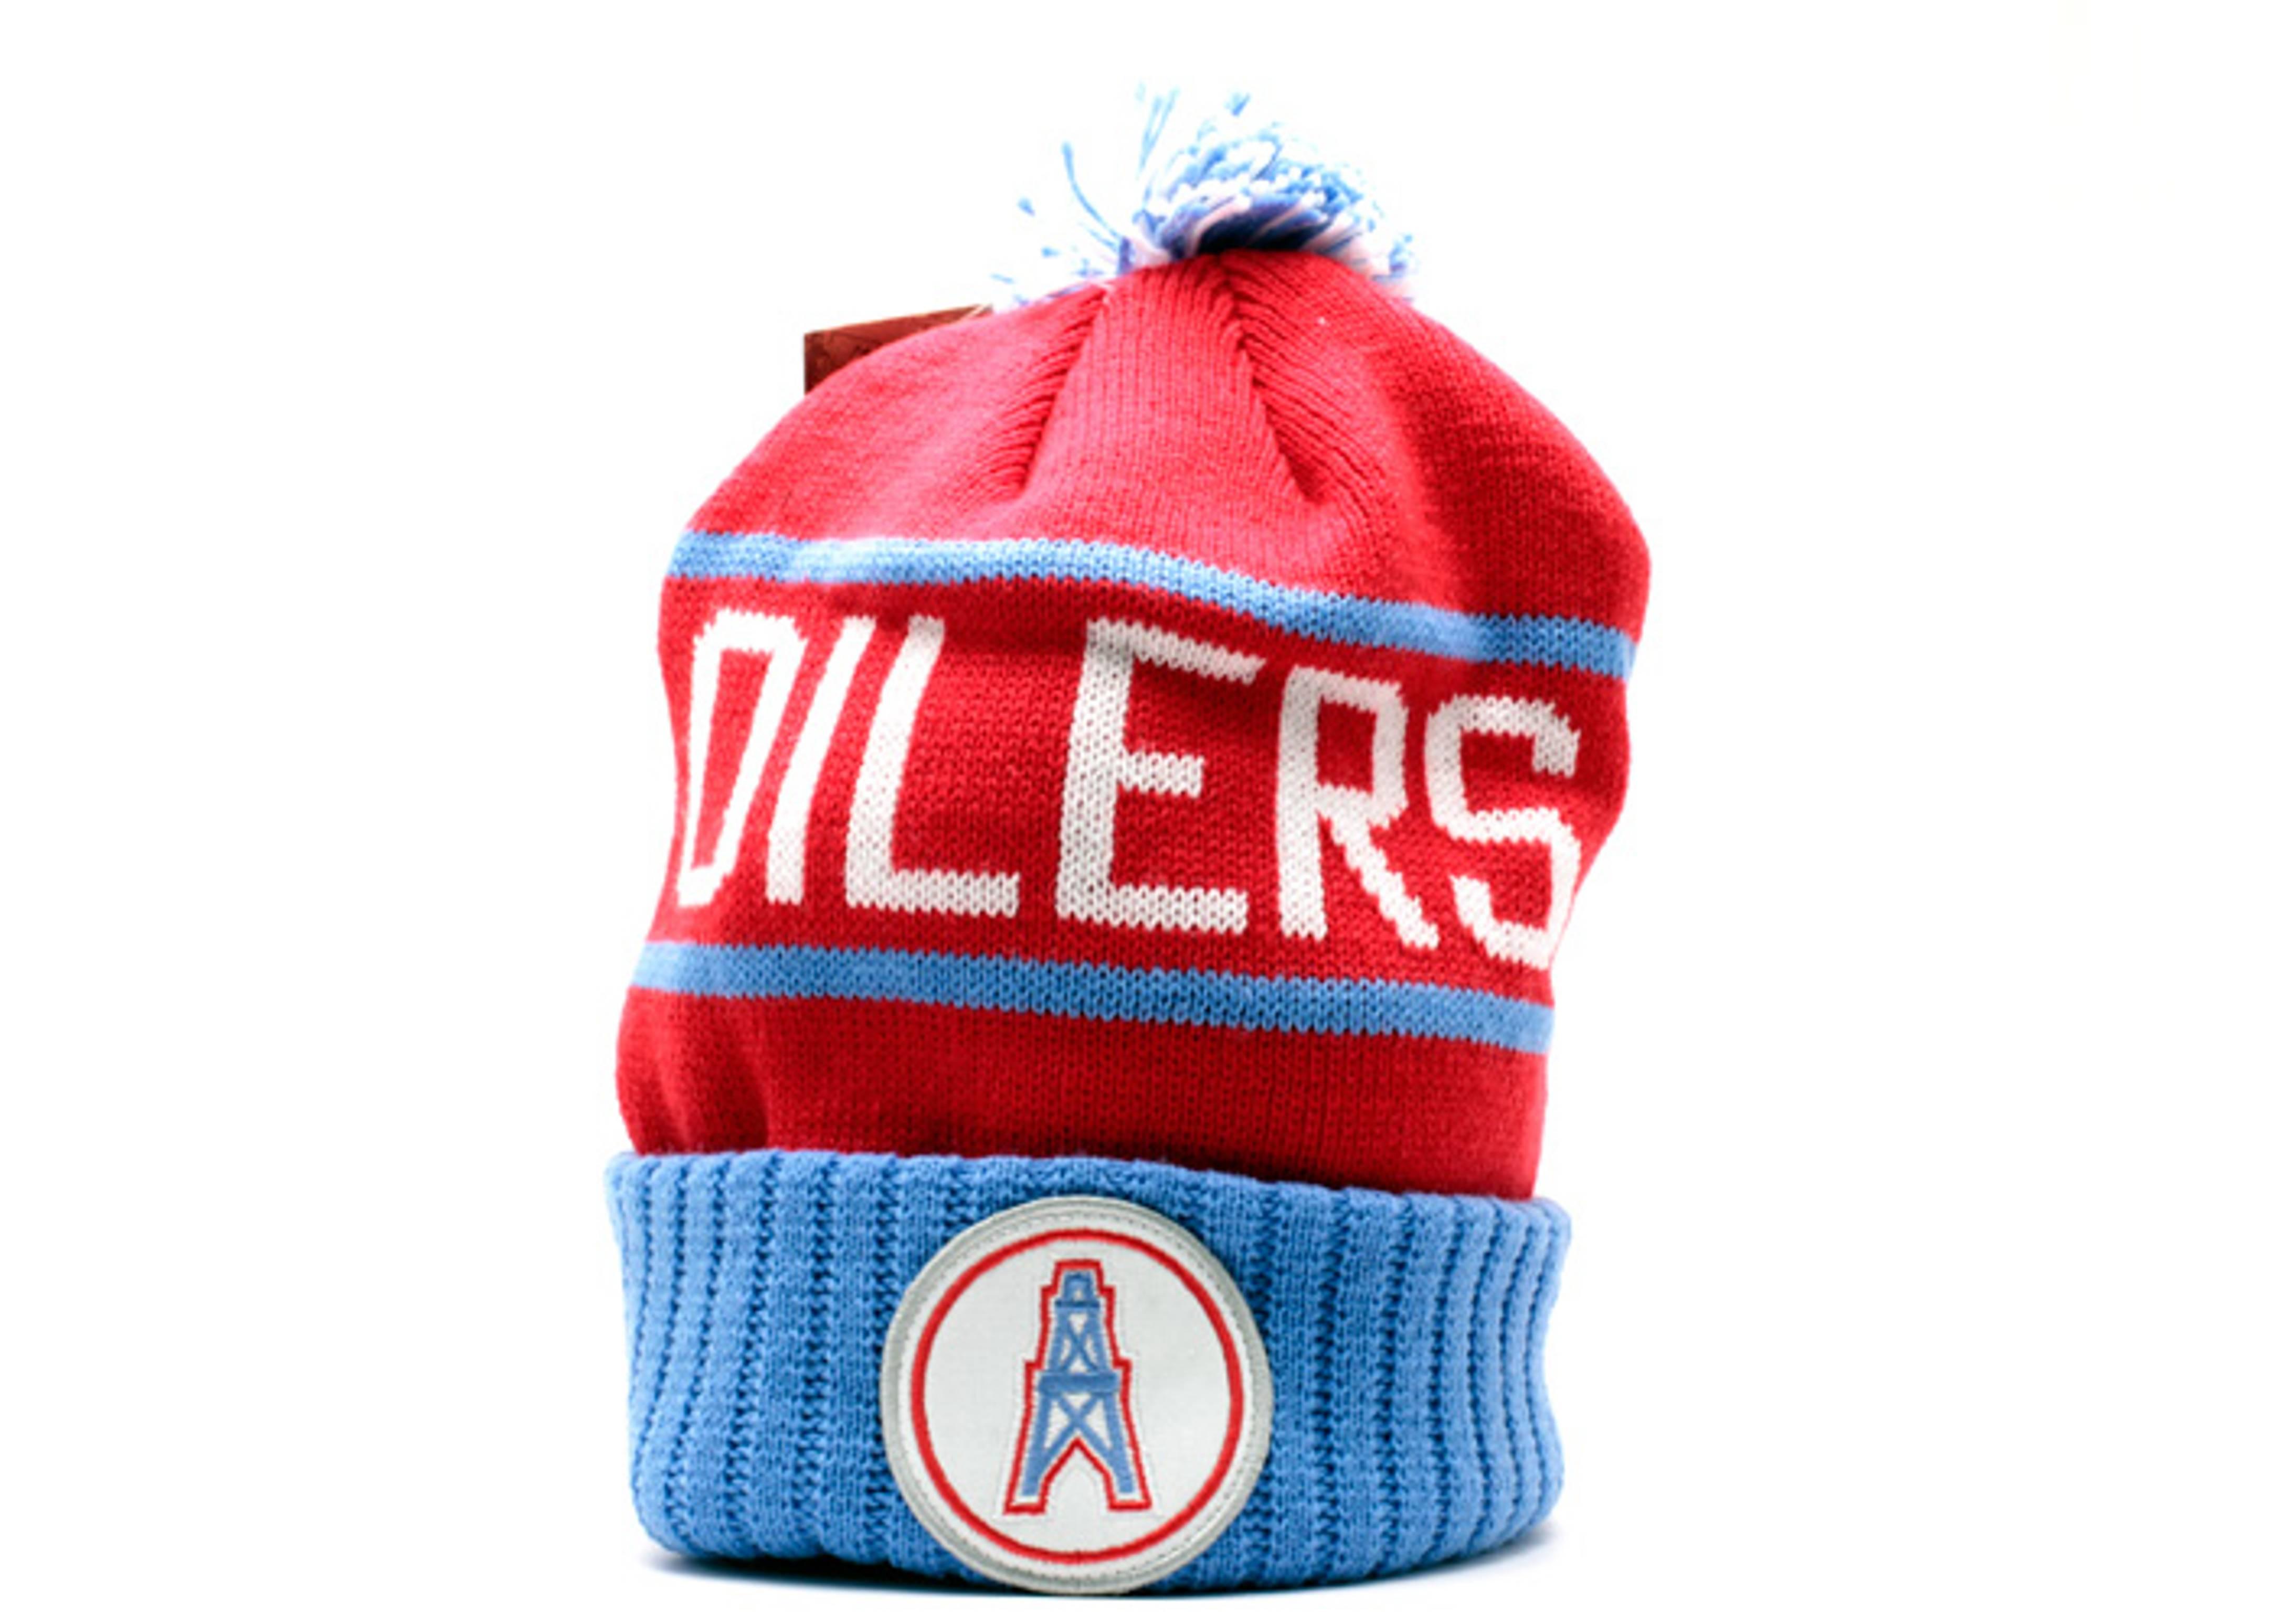 66b864274 Houston Oilers Cuffed Pom Knit Beanie - Mitchell   Ness - kj48mtc6oiler -  red light blue-white